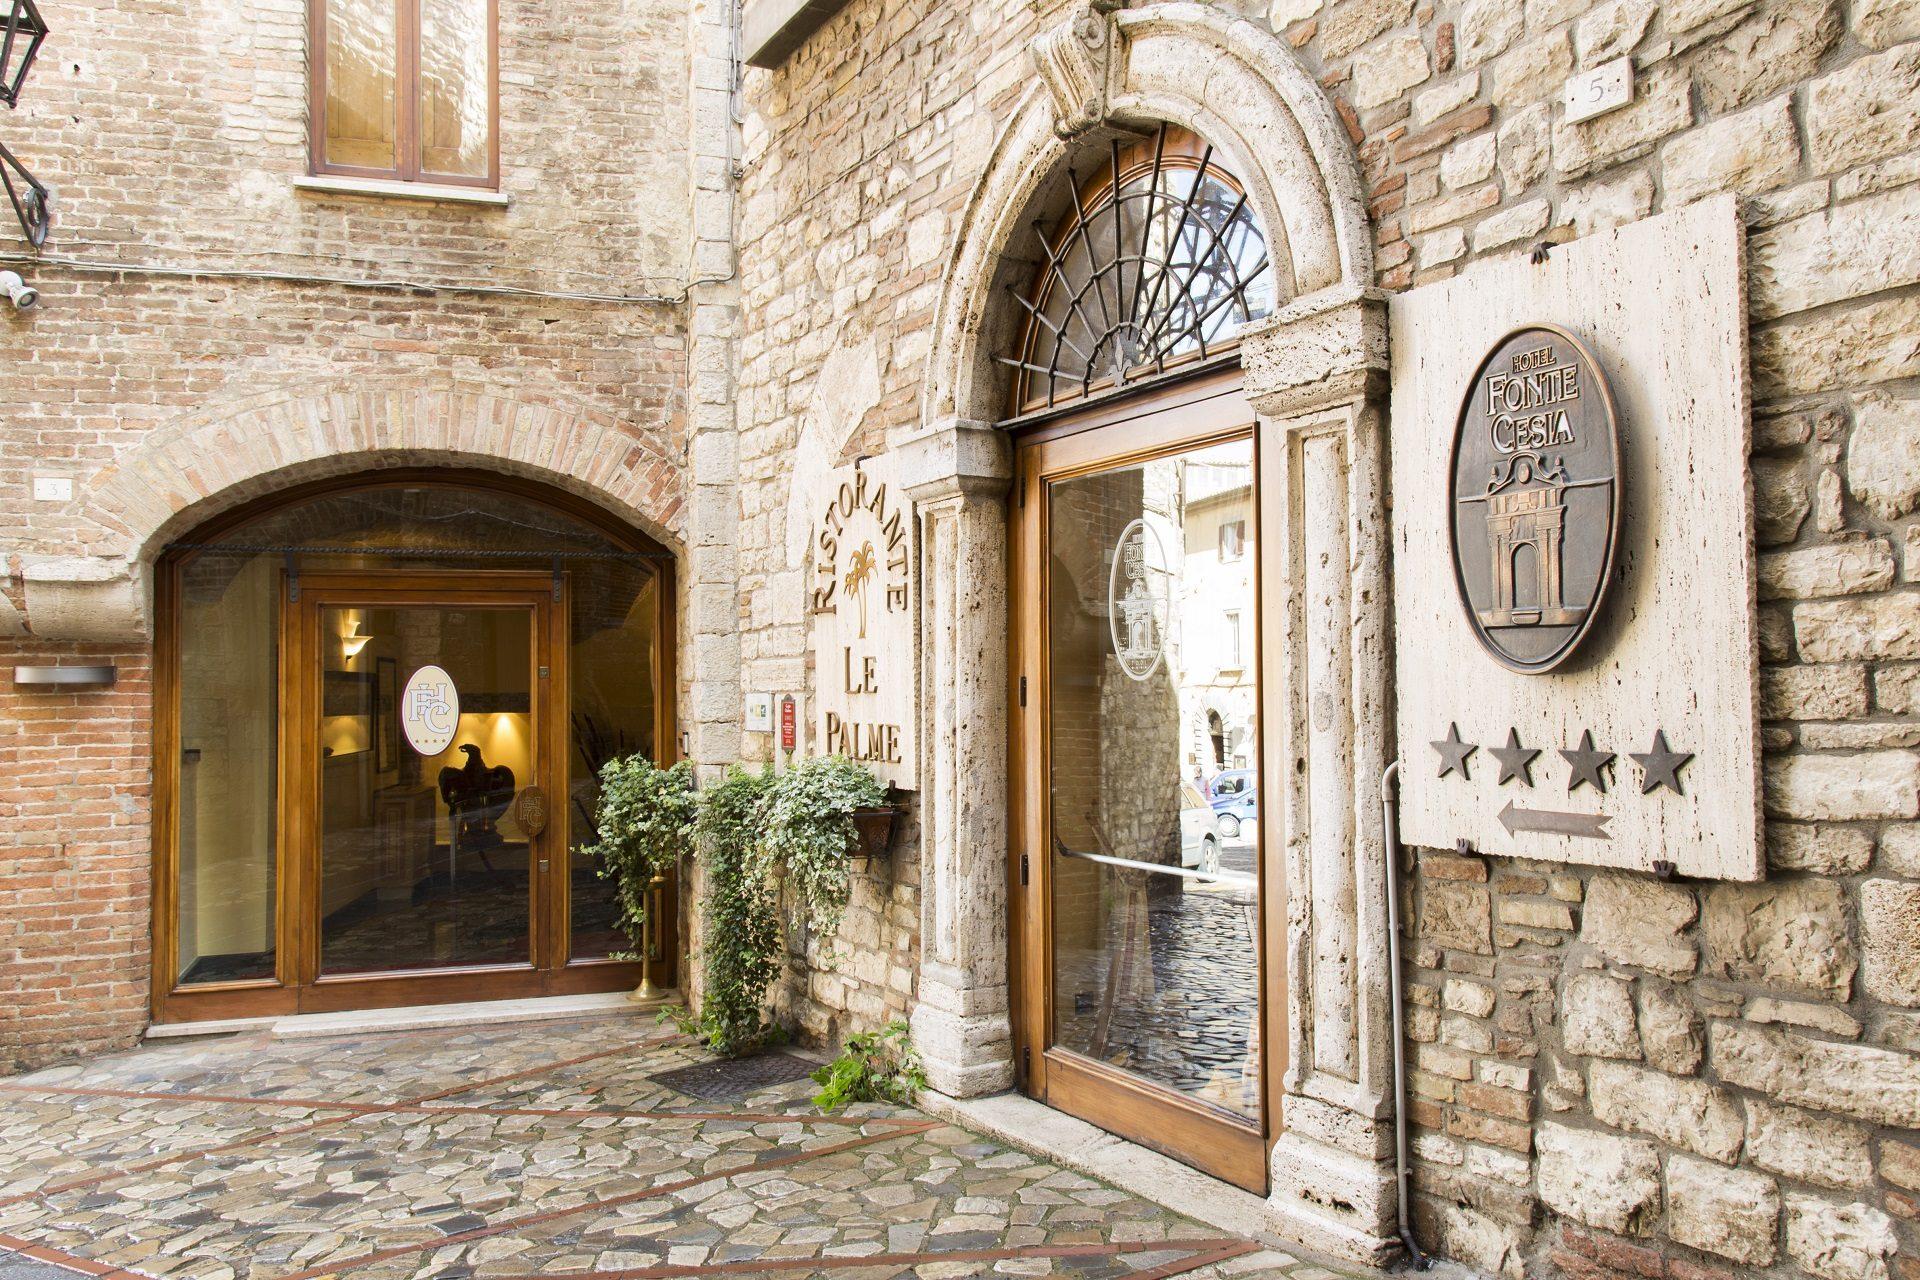 Hotel Fonte Cesia - Ingresso- entrance